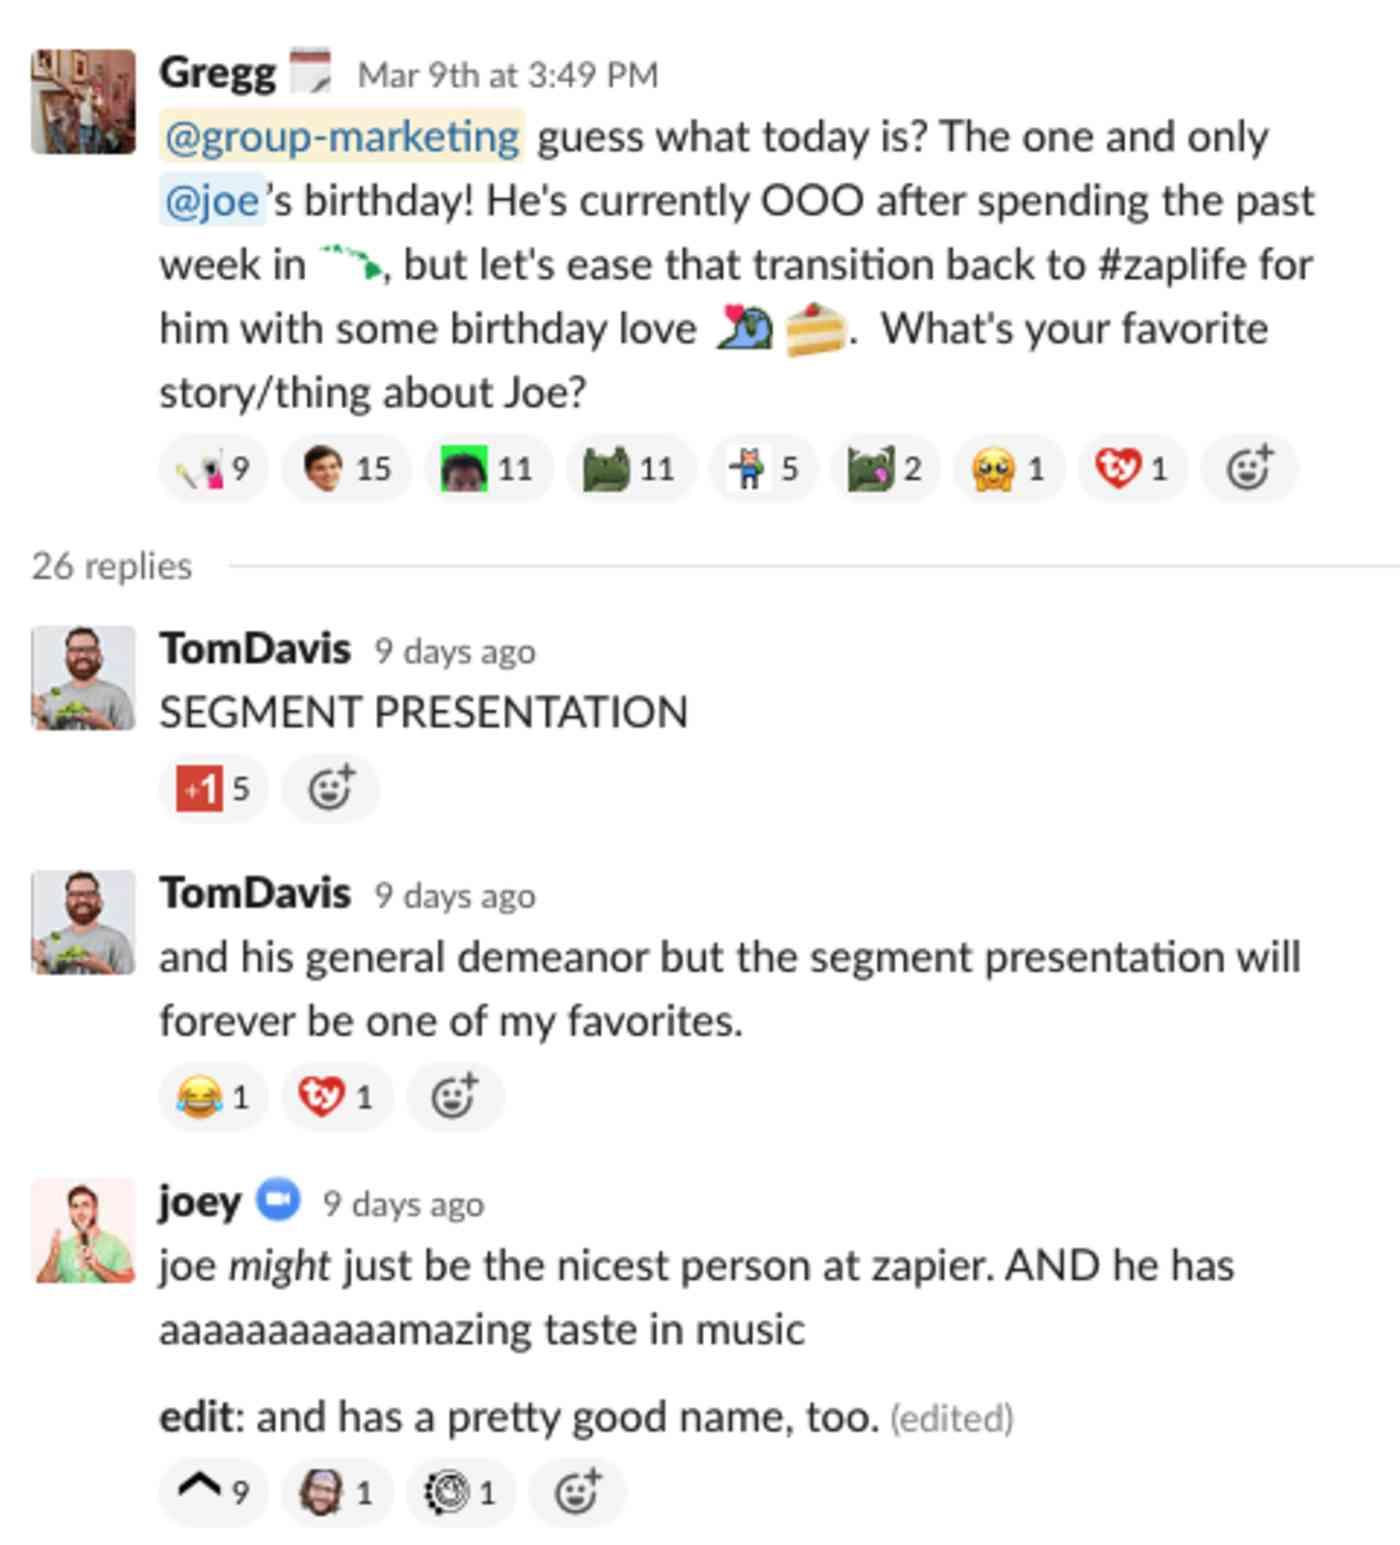 A very public happy birthday message